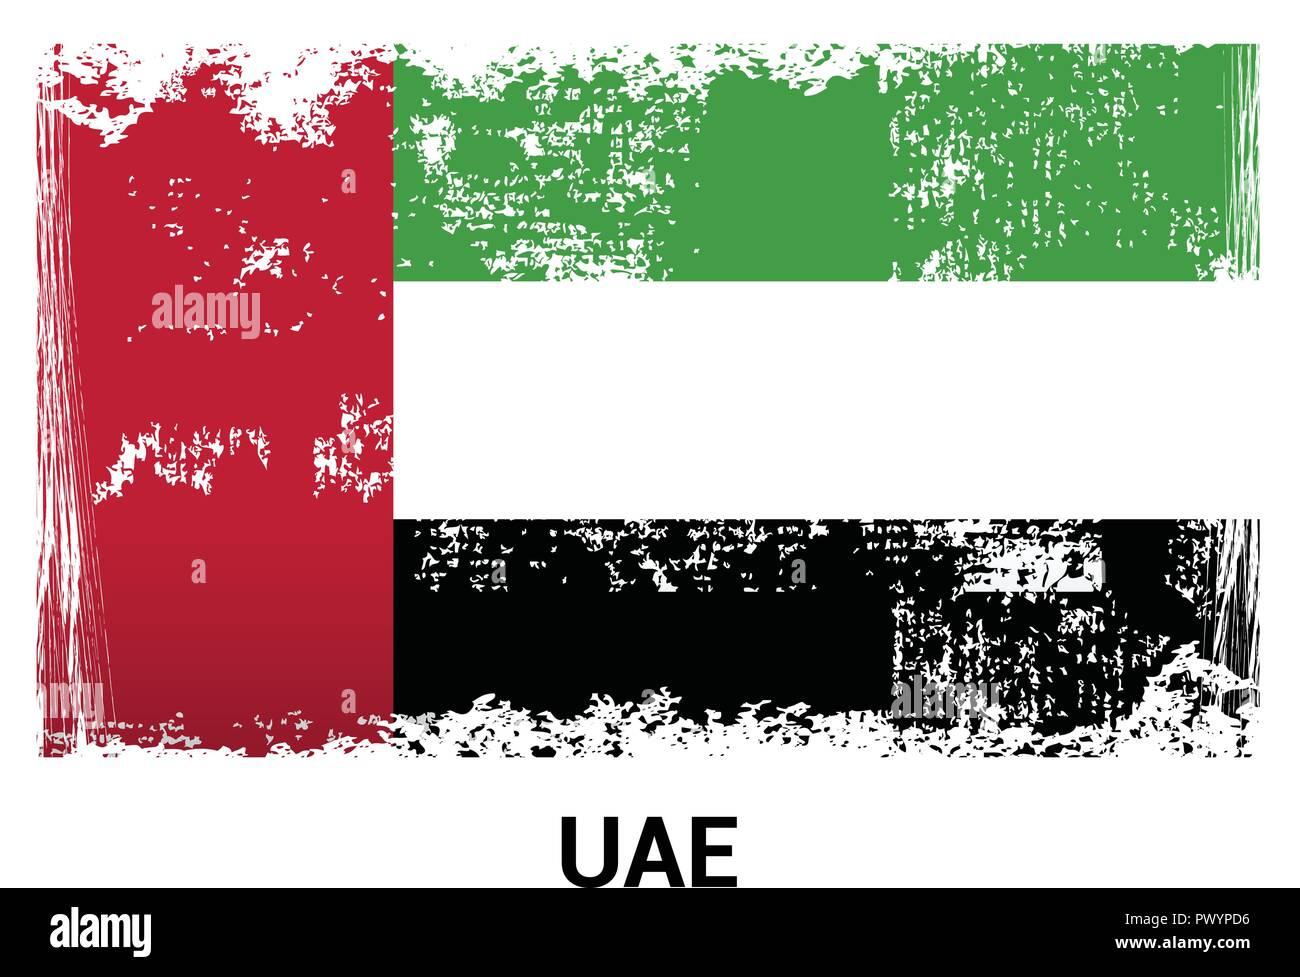 UAE flag design vector Stock Vector Image & Art - Alamy